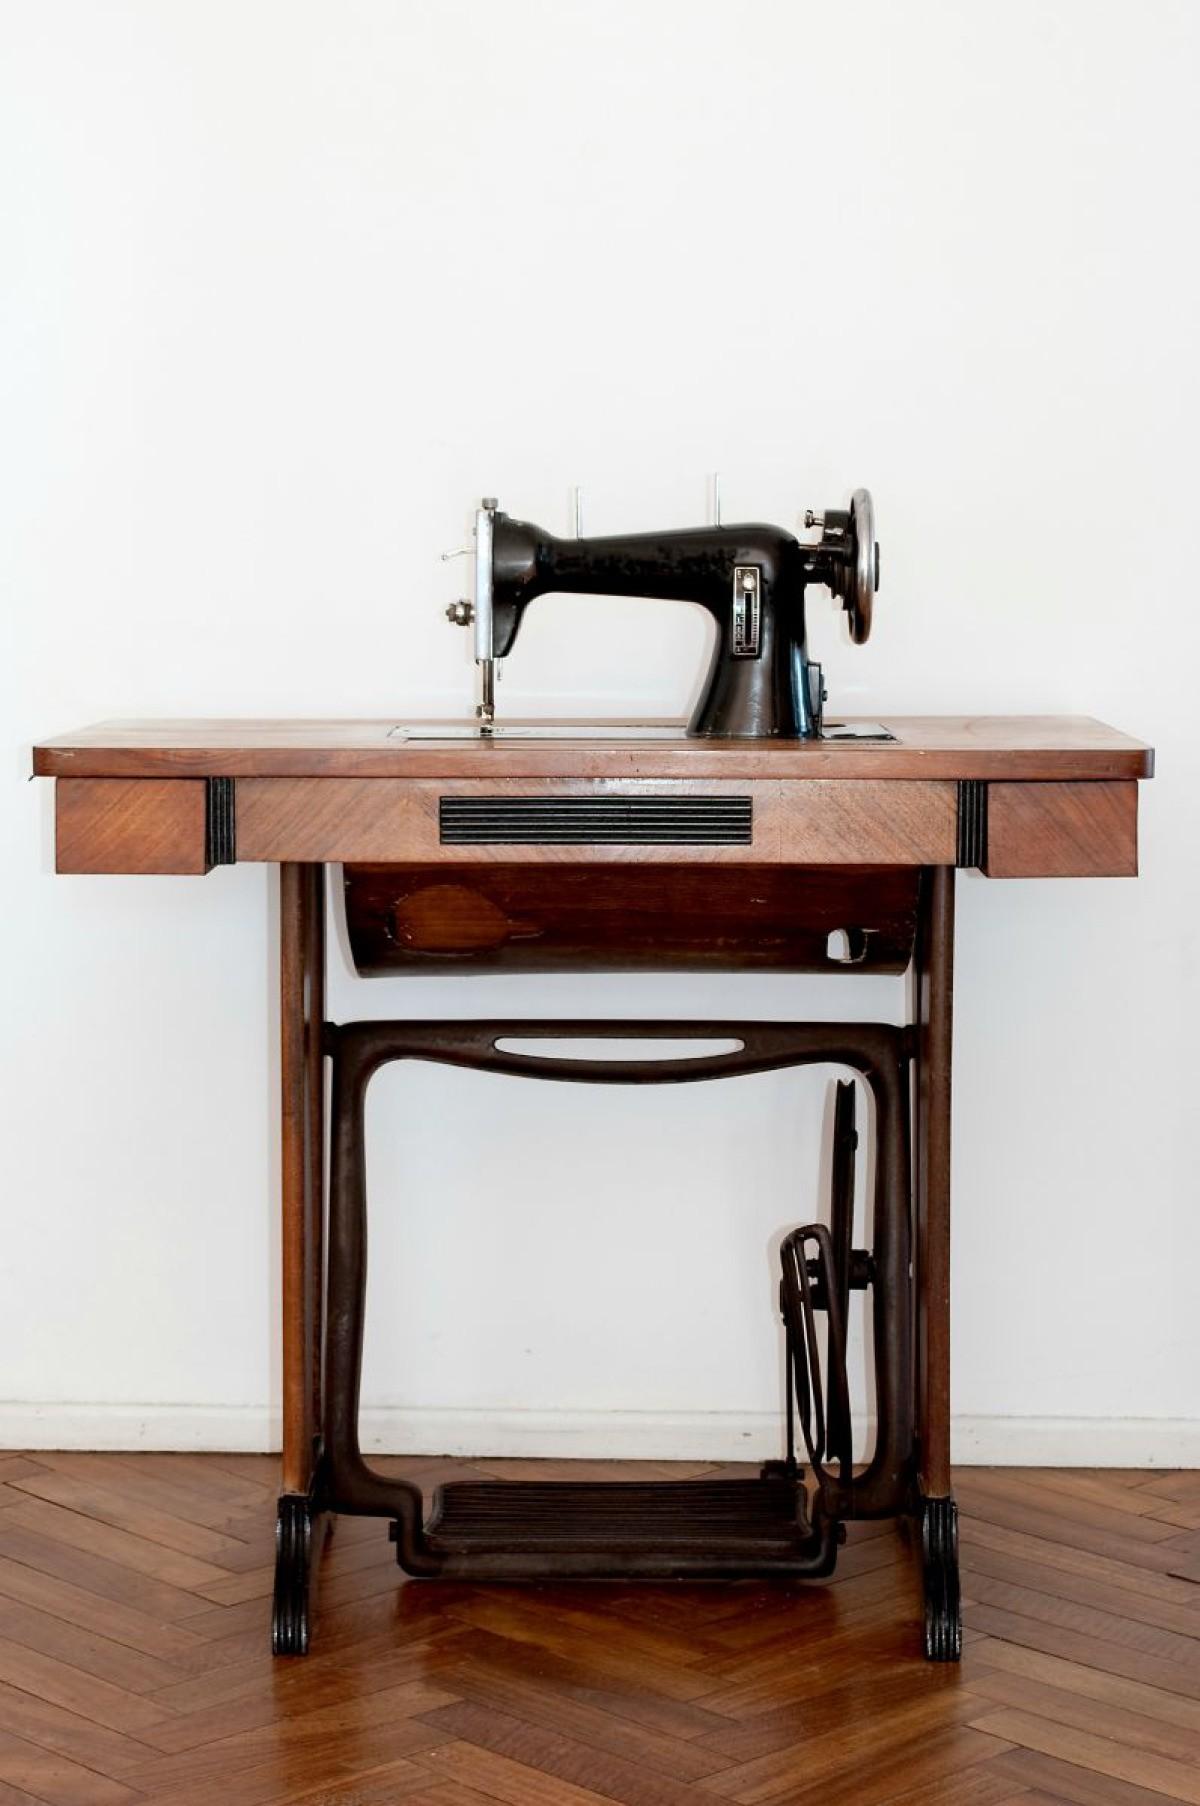 Refurbishing a Vintage Sewing Machine | ThriftyFun